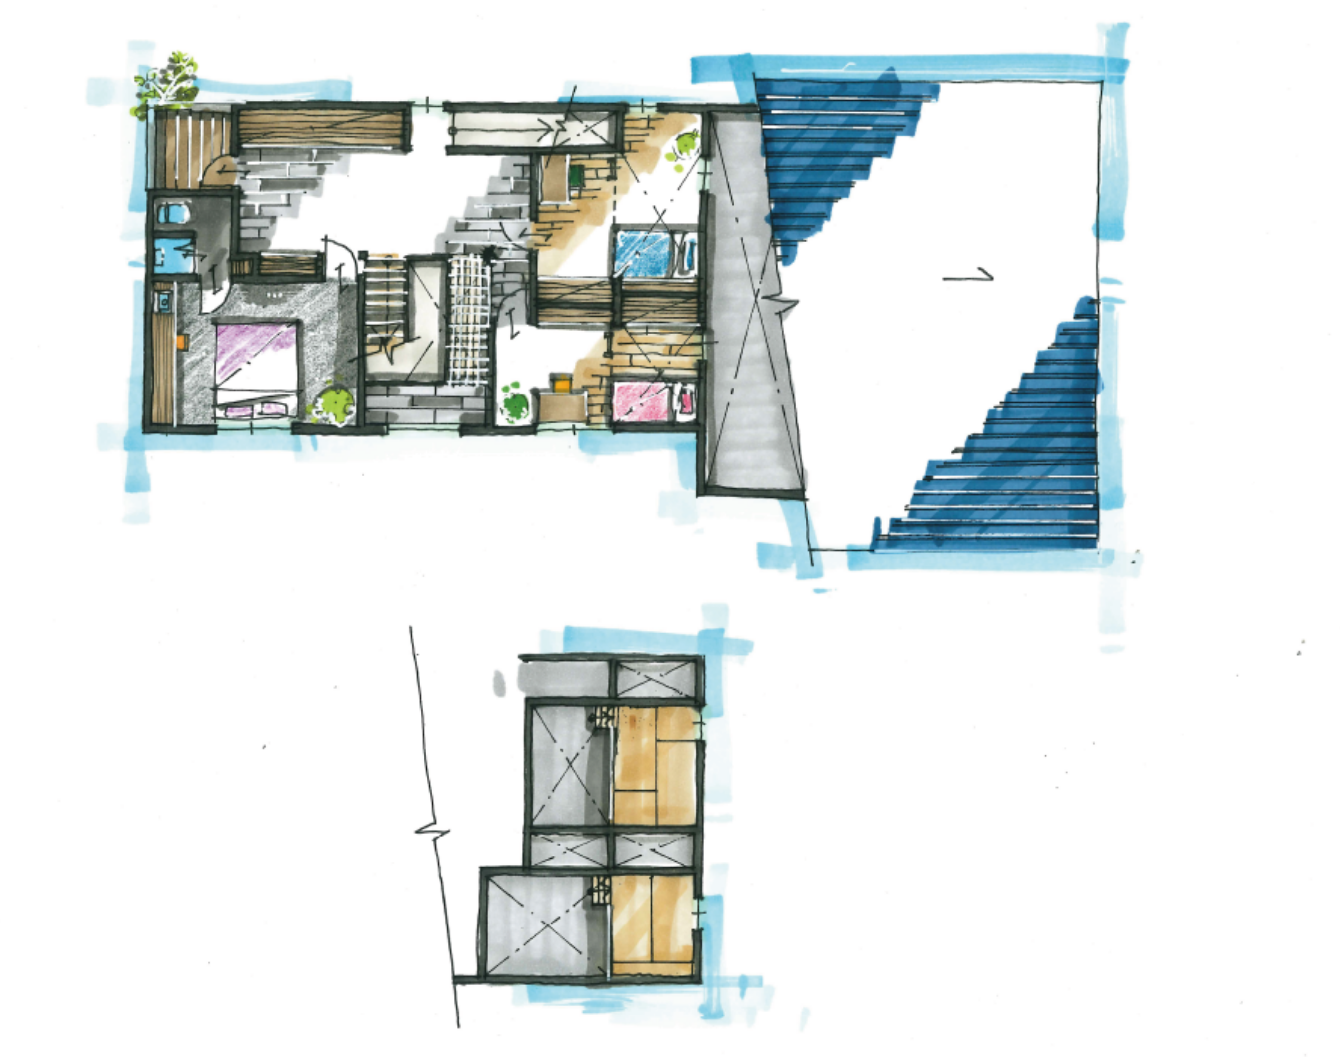 CONCEPT HOUSE 02